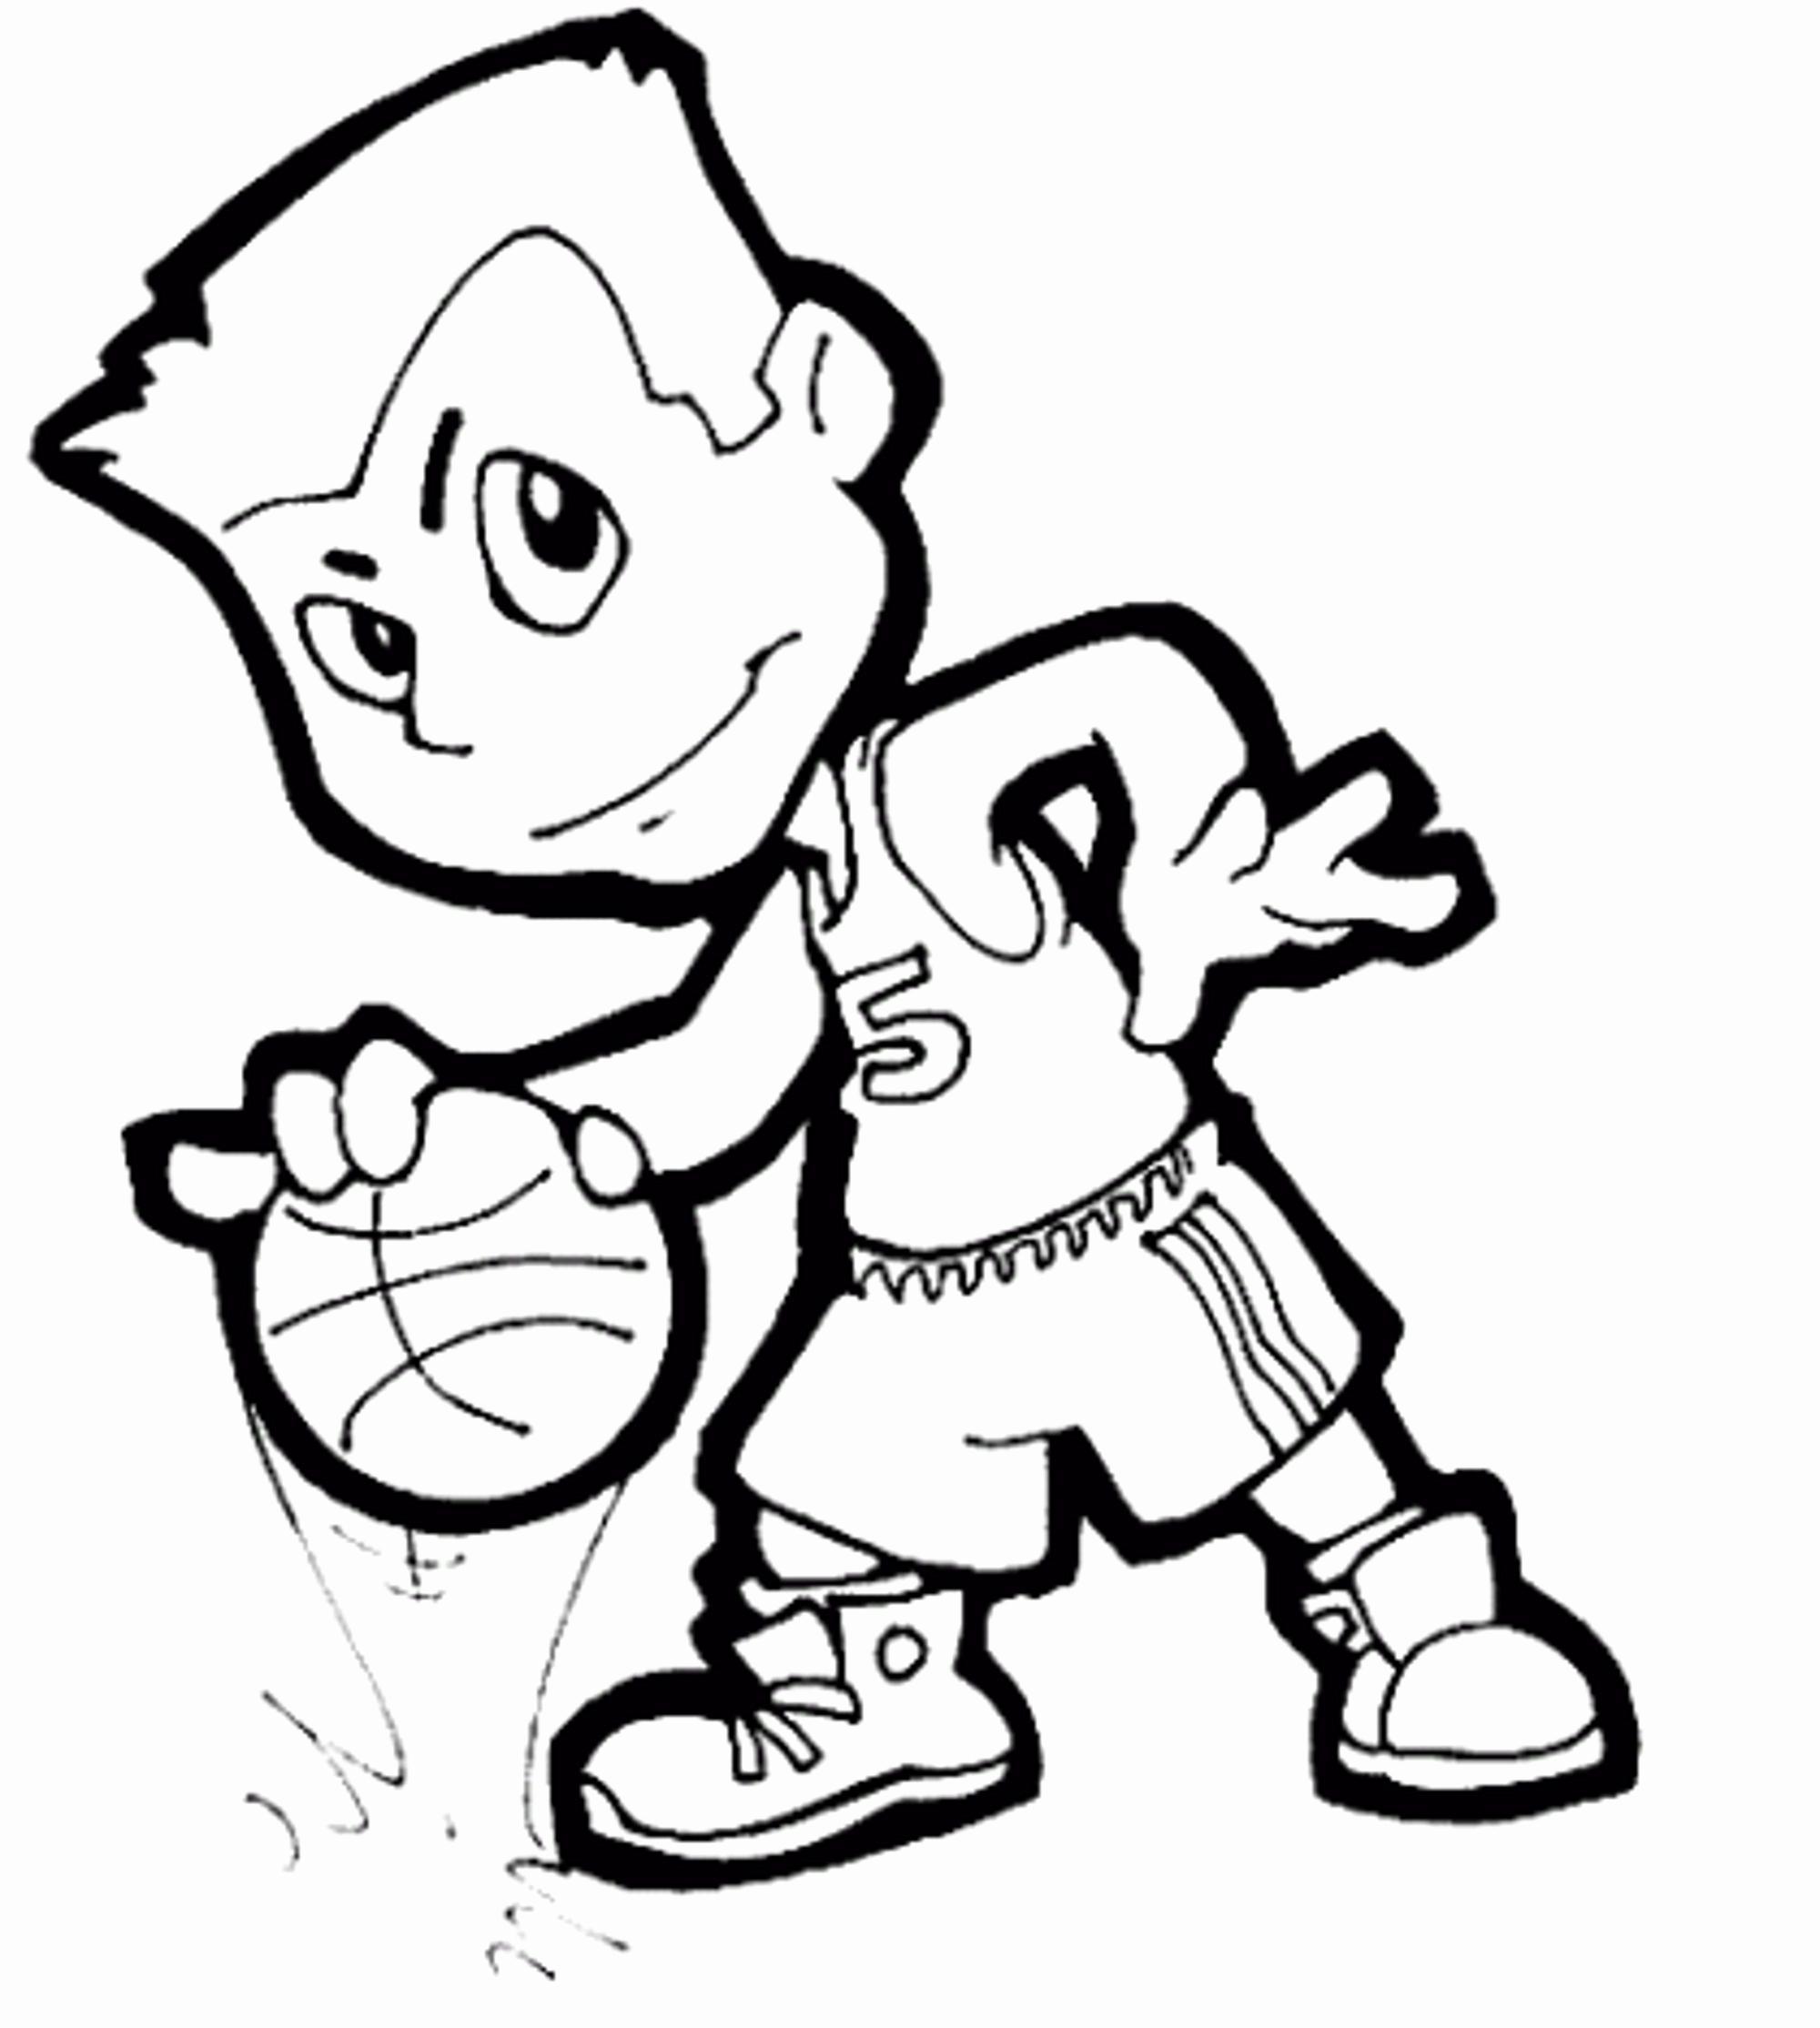 2000x2229 Celtics Basketball Coloring Pages Collection Boston Celtics